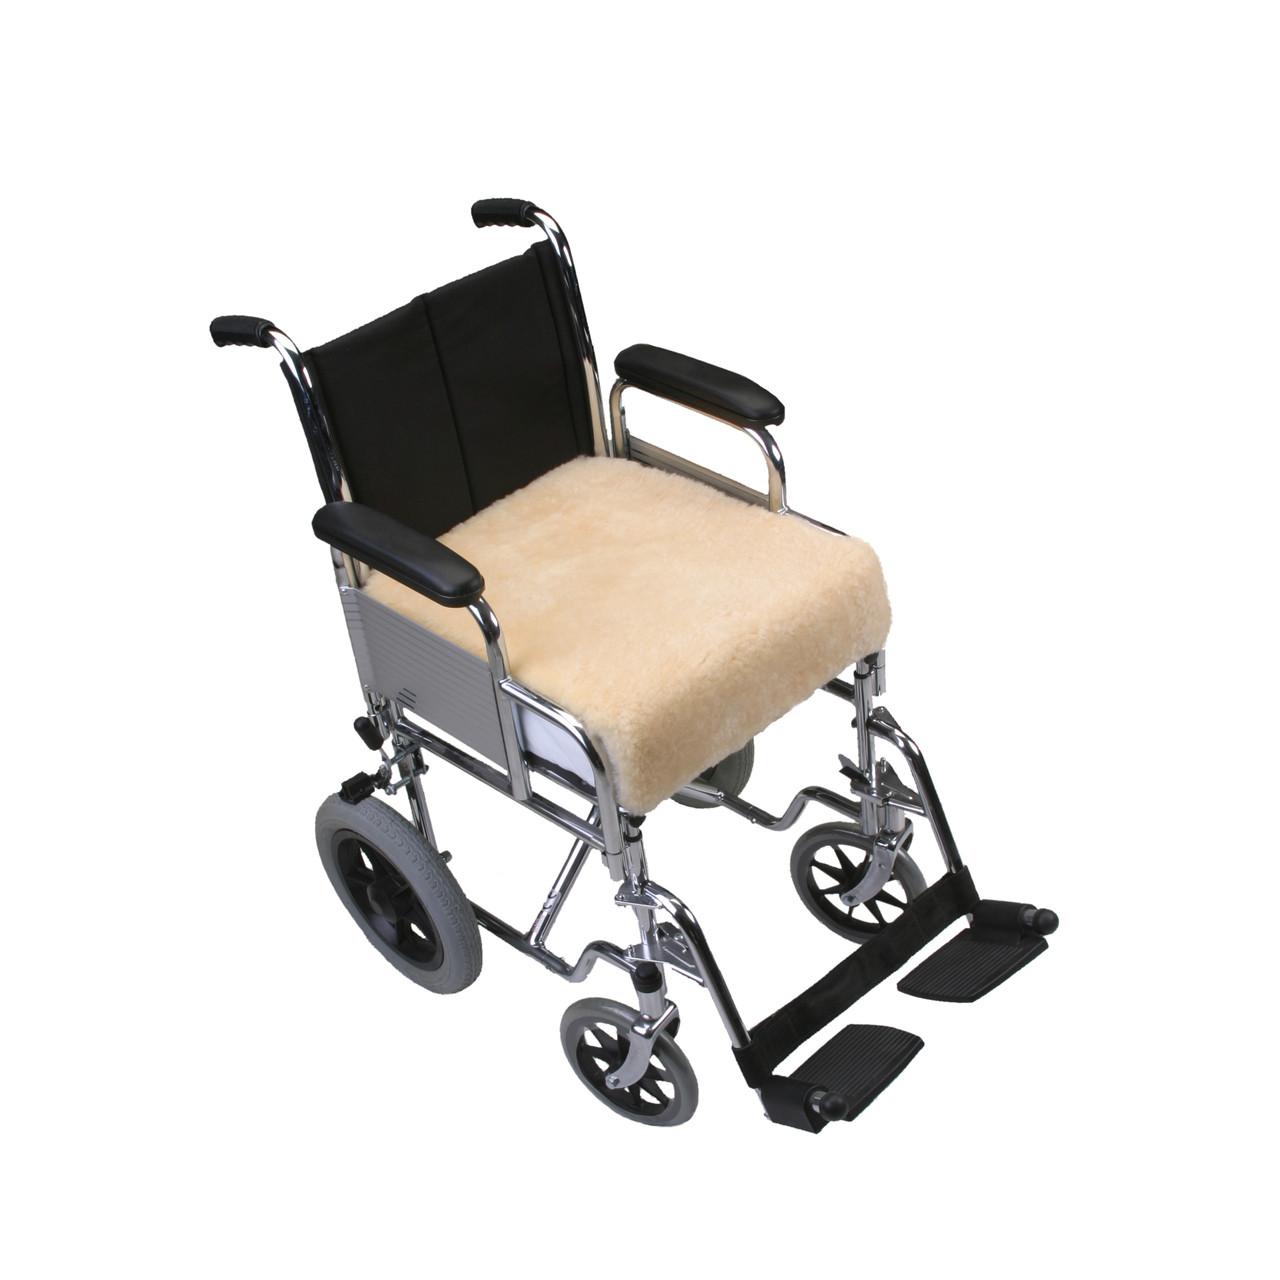 wheelchair gst vinyl strap chaise lounge chairs mi woollies dr wool medical sheepskin padded wheel chair